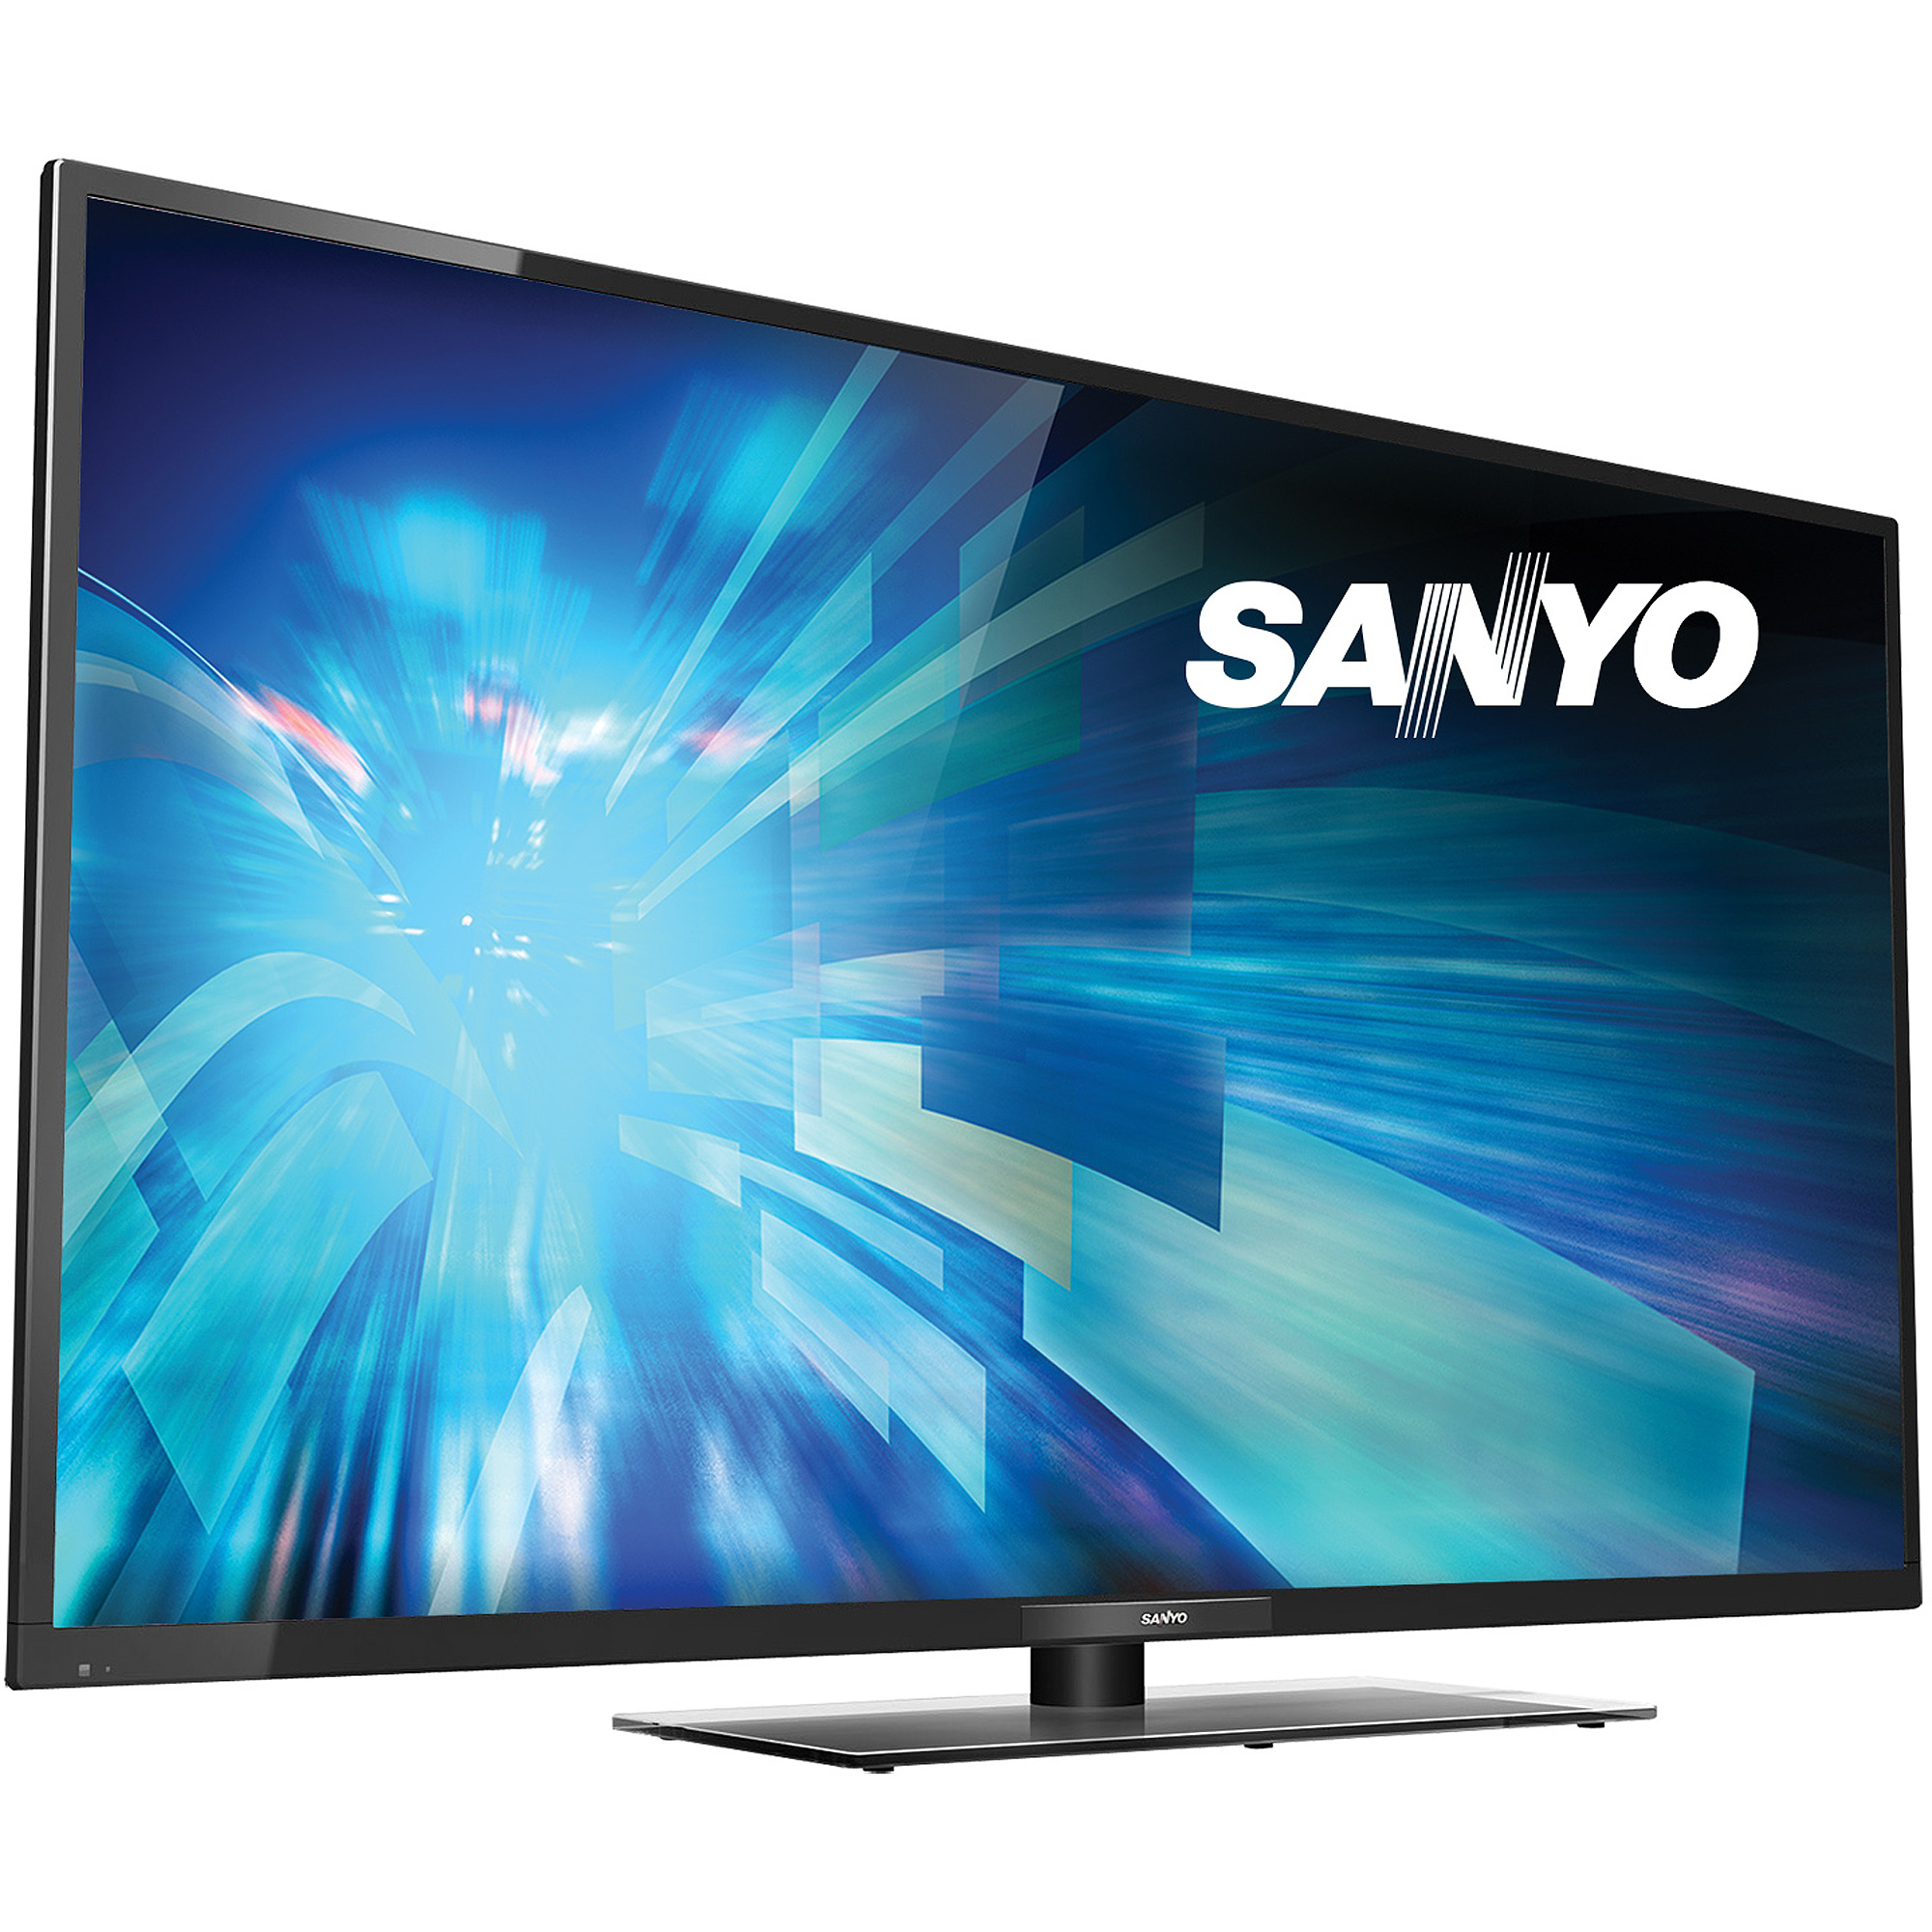 "SANYO DP55D44 55"" 1080p 60Hz LED HDTV"